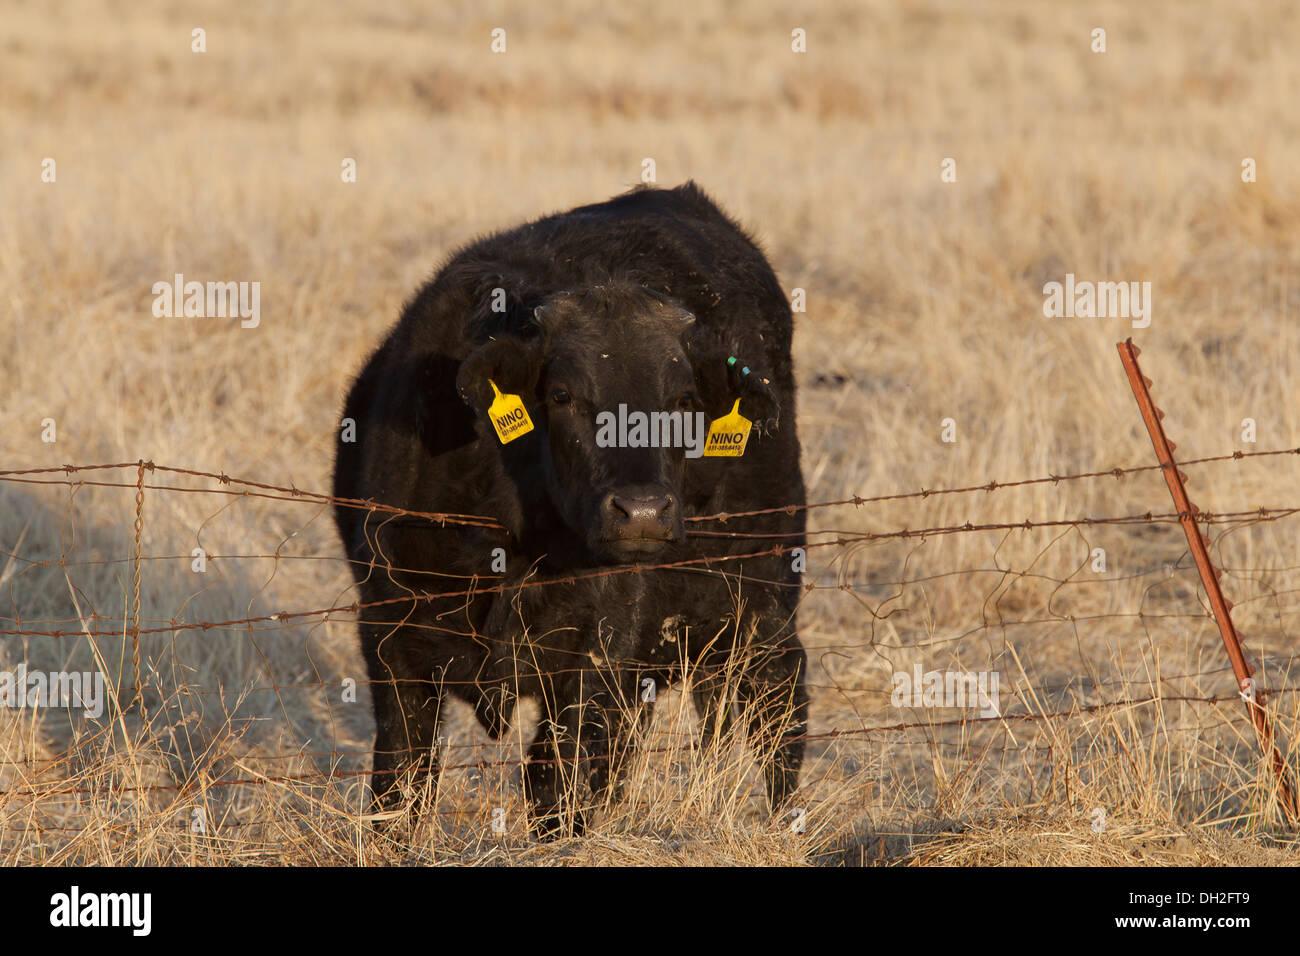 Angus cow in dry grass field - Coalinga, California USA - Stock Image